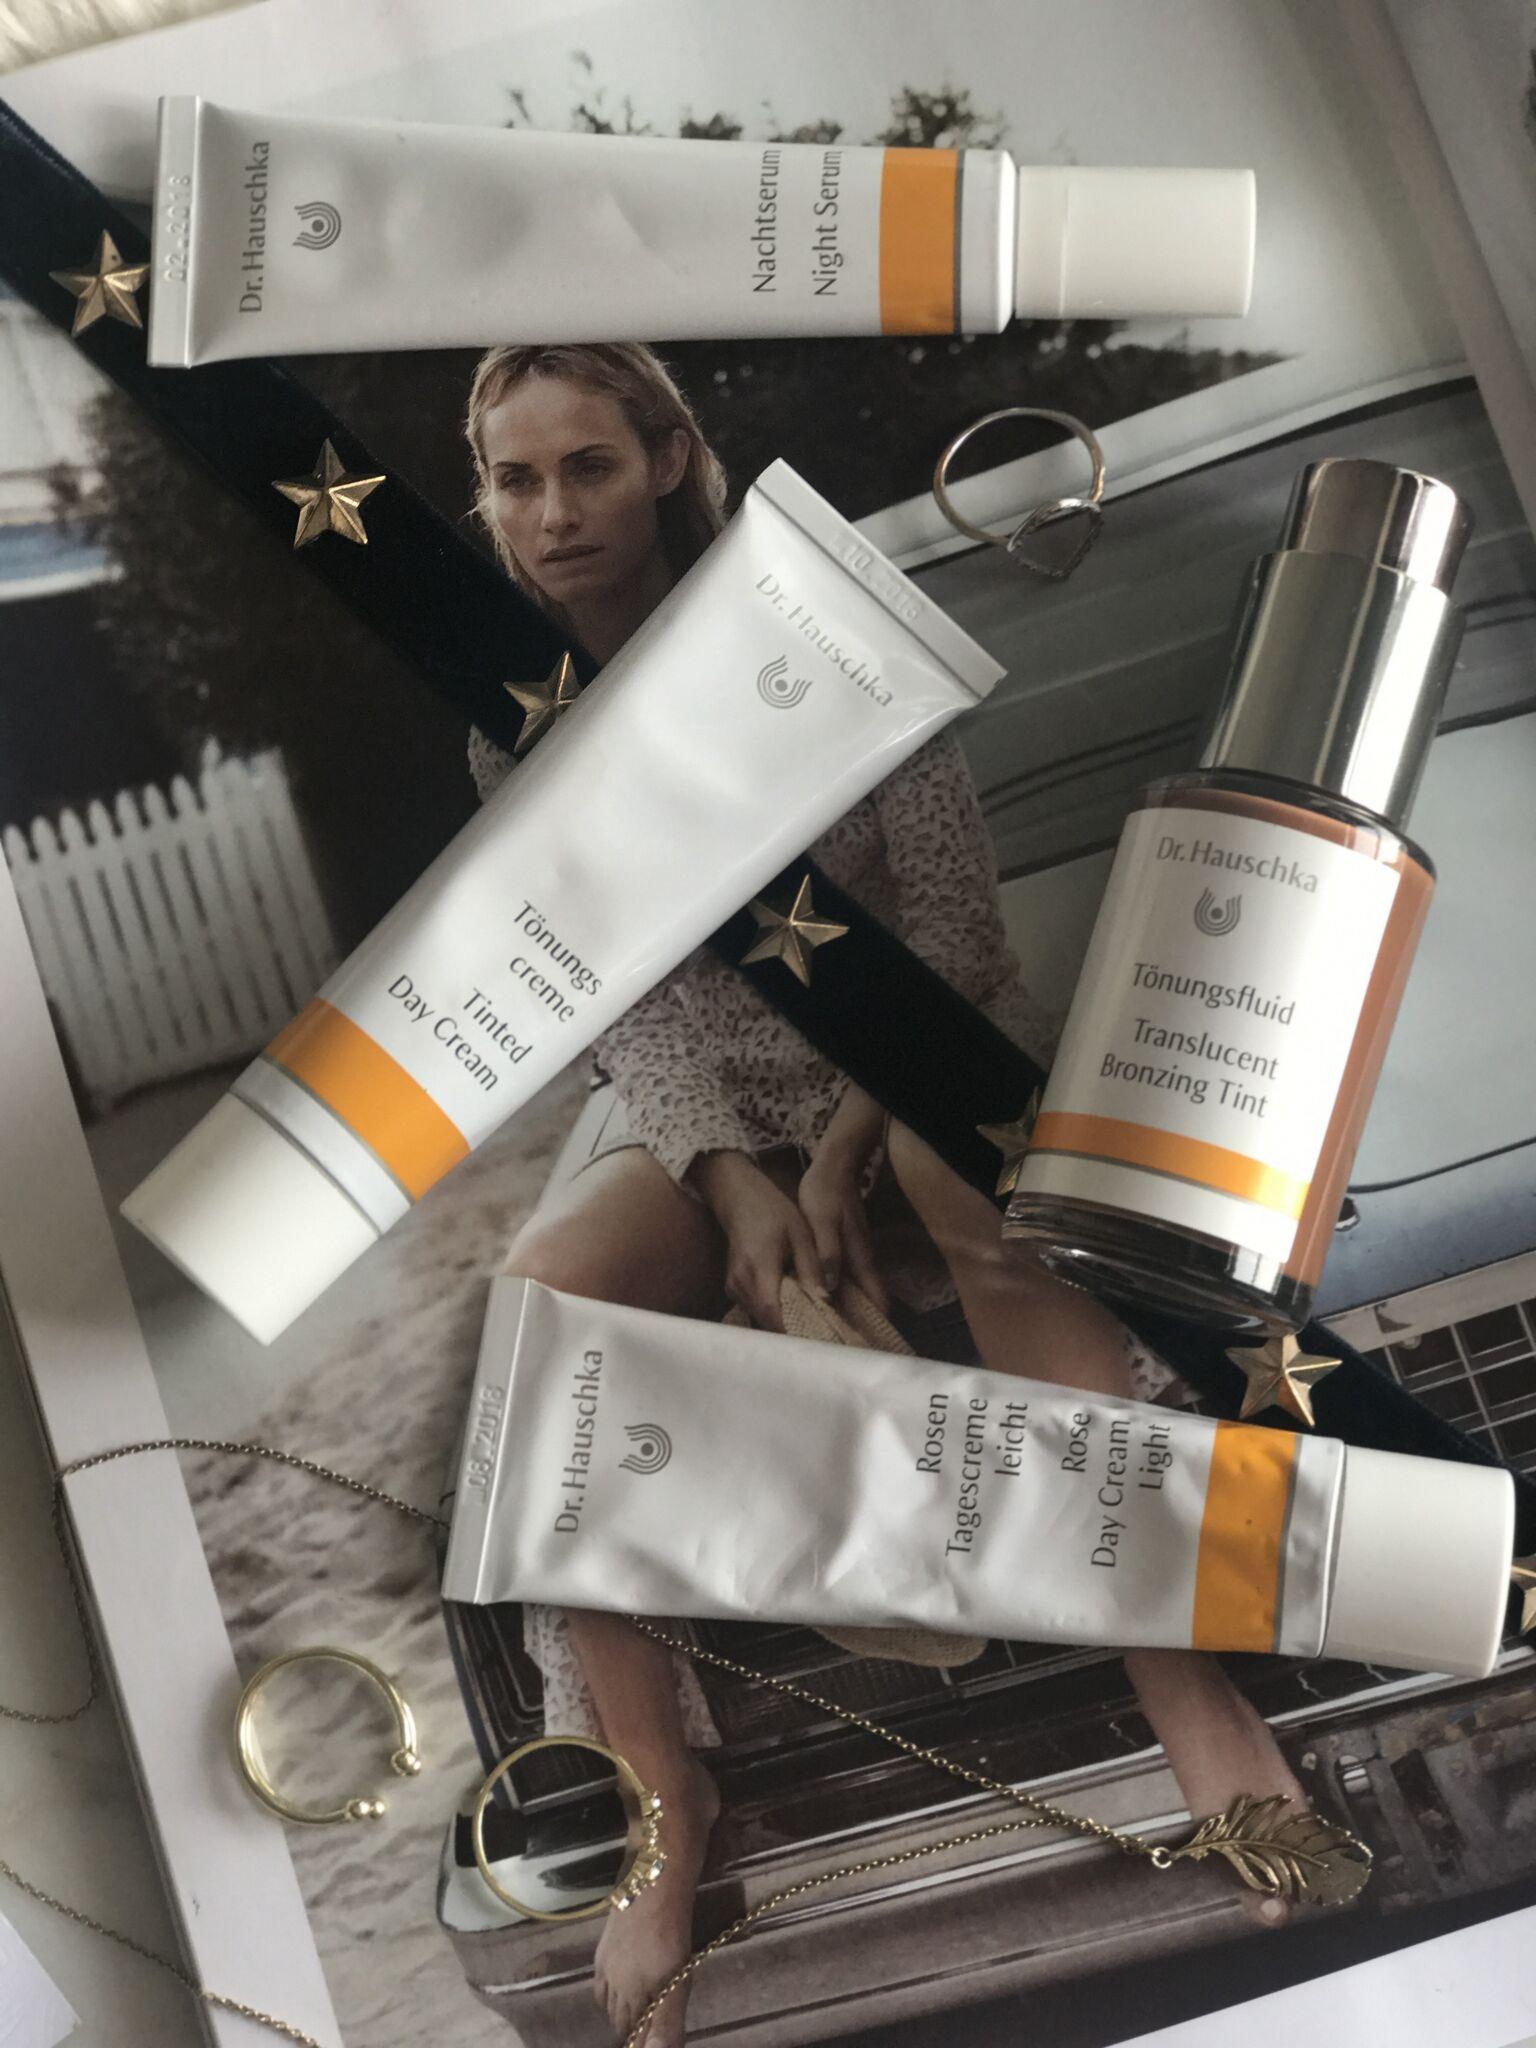 Dr Hauschka Skincare Range, The Creative Larder, Beauty blogger review.